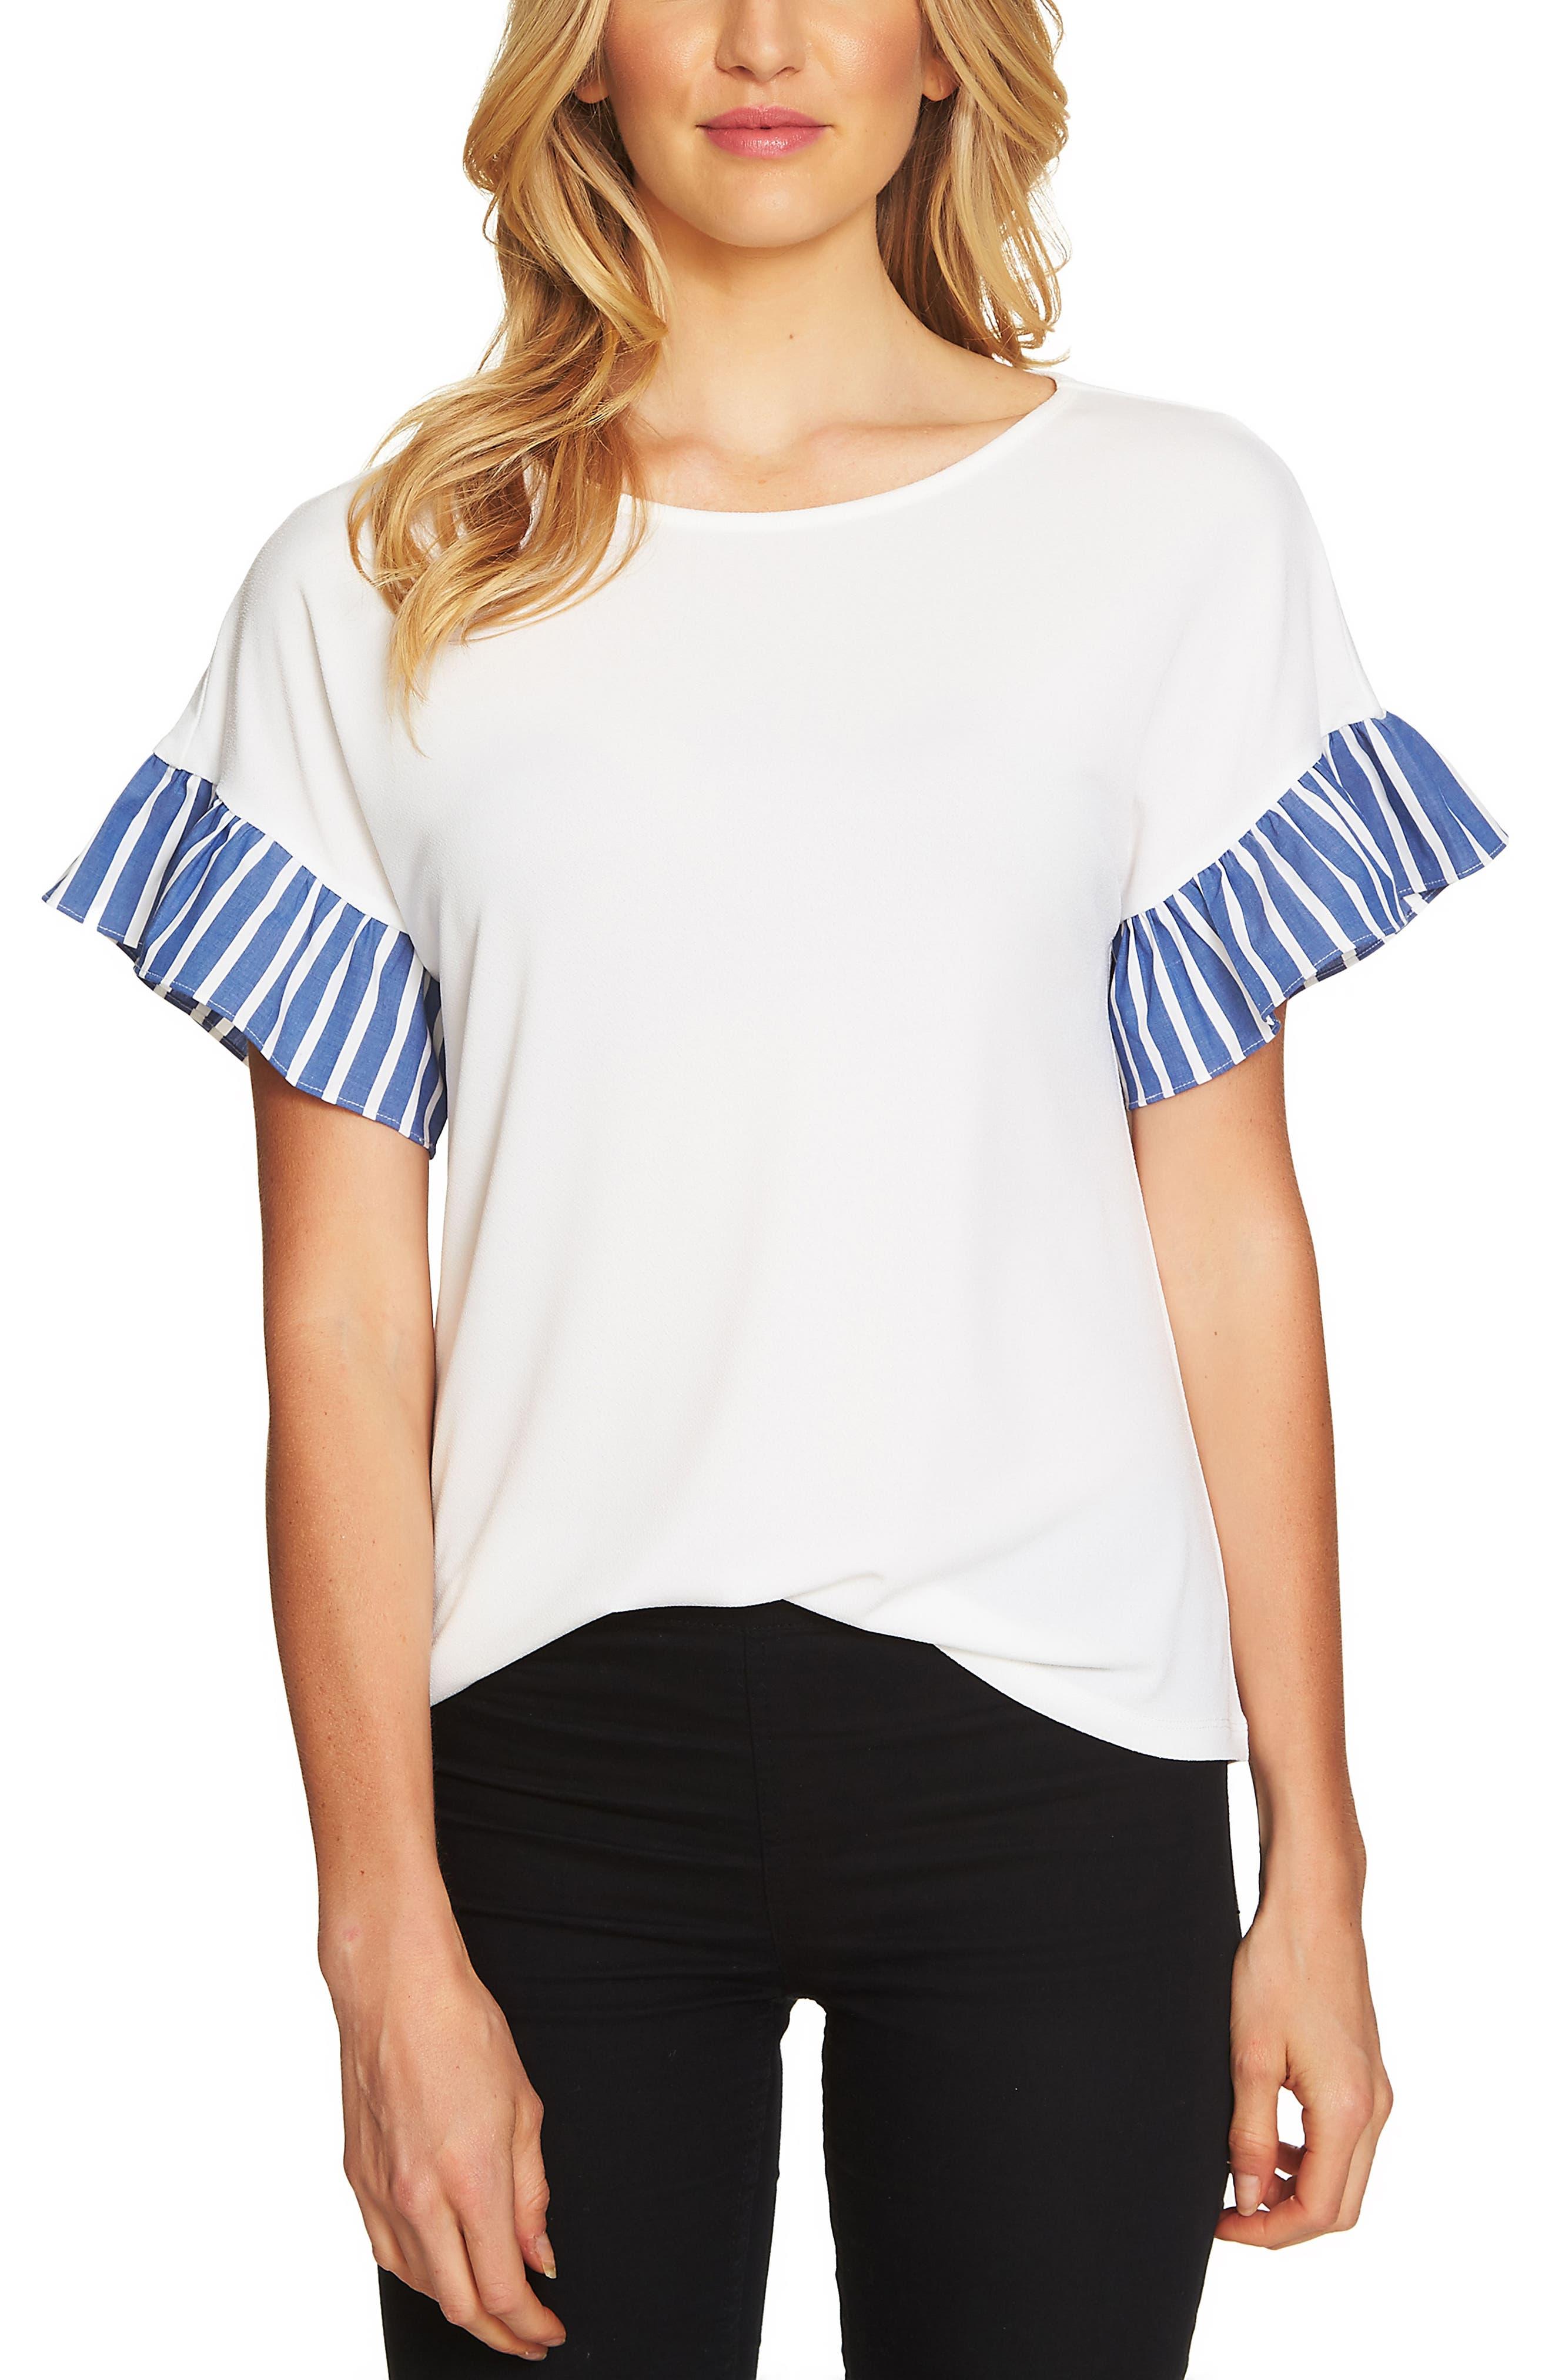 Alternate Image 1 Selected - CeCe Stripe Ruffle Sleeve Top